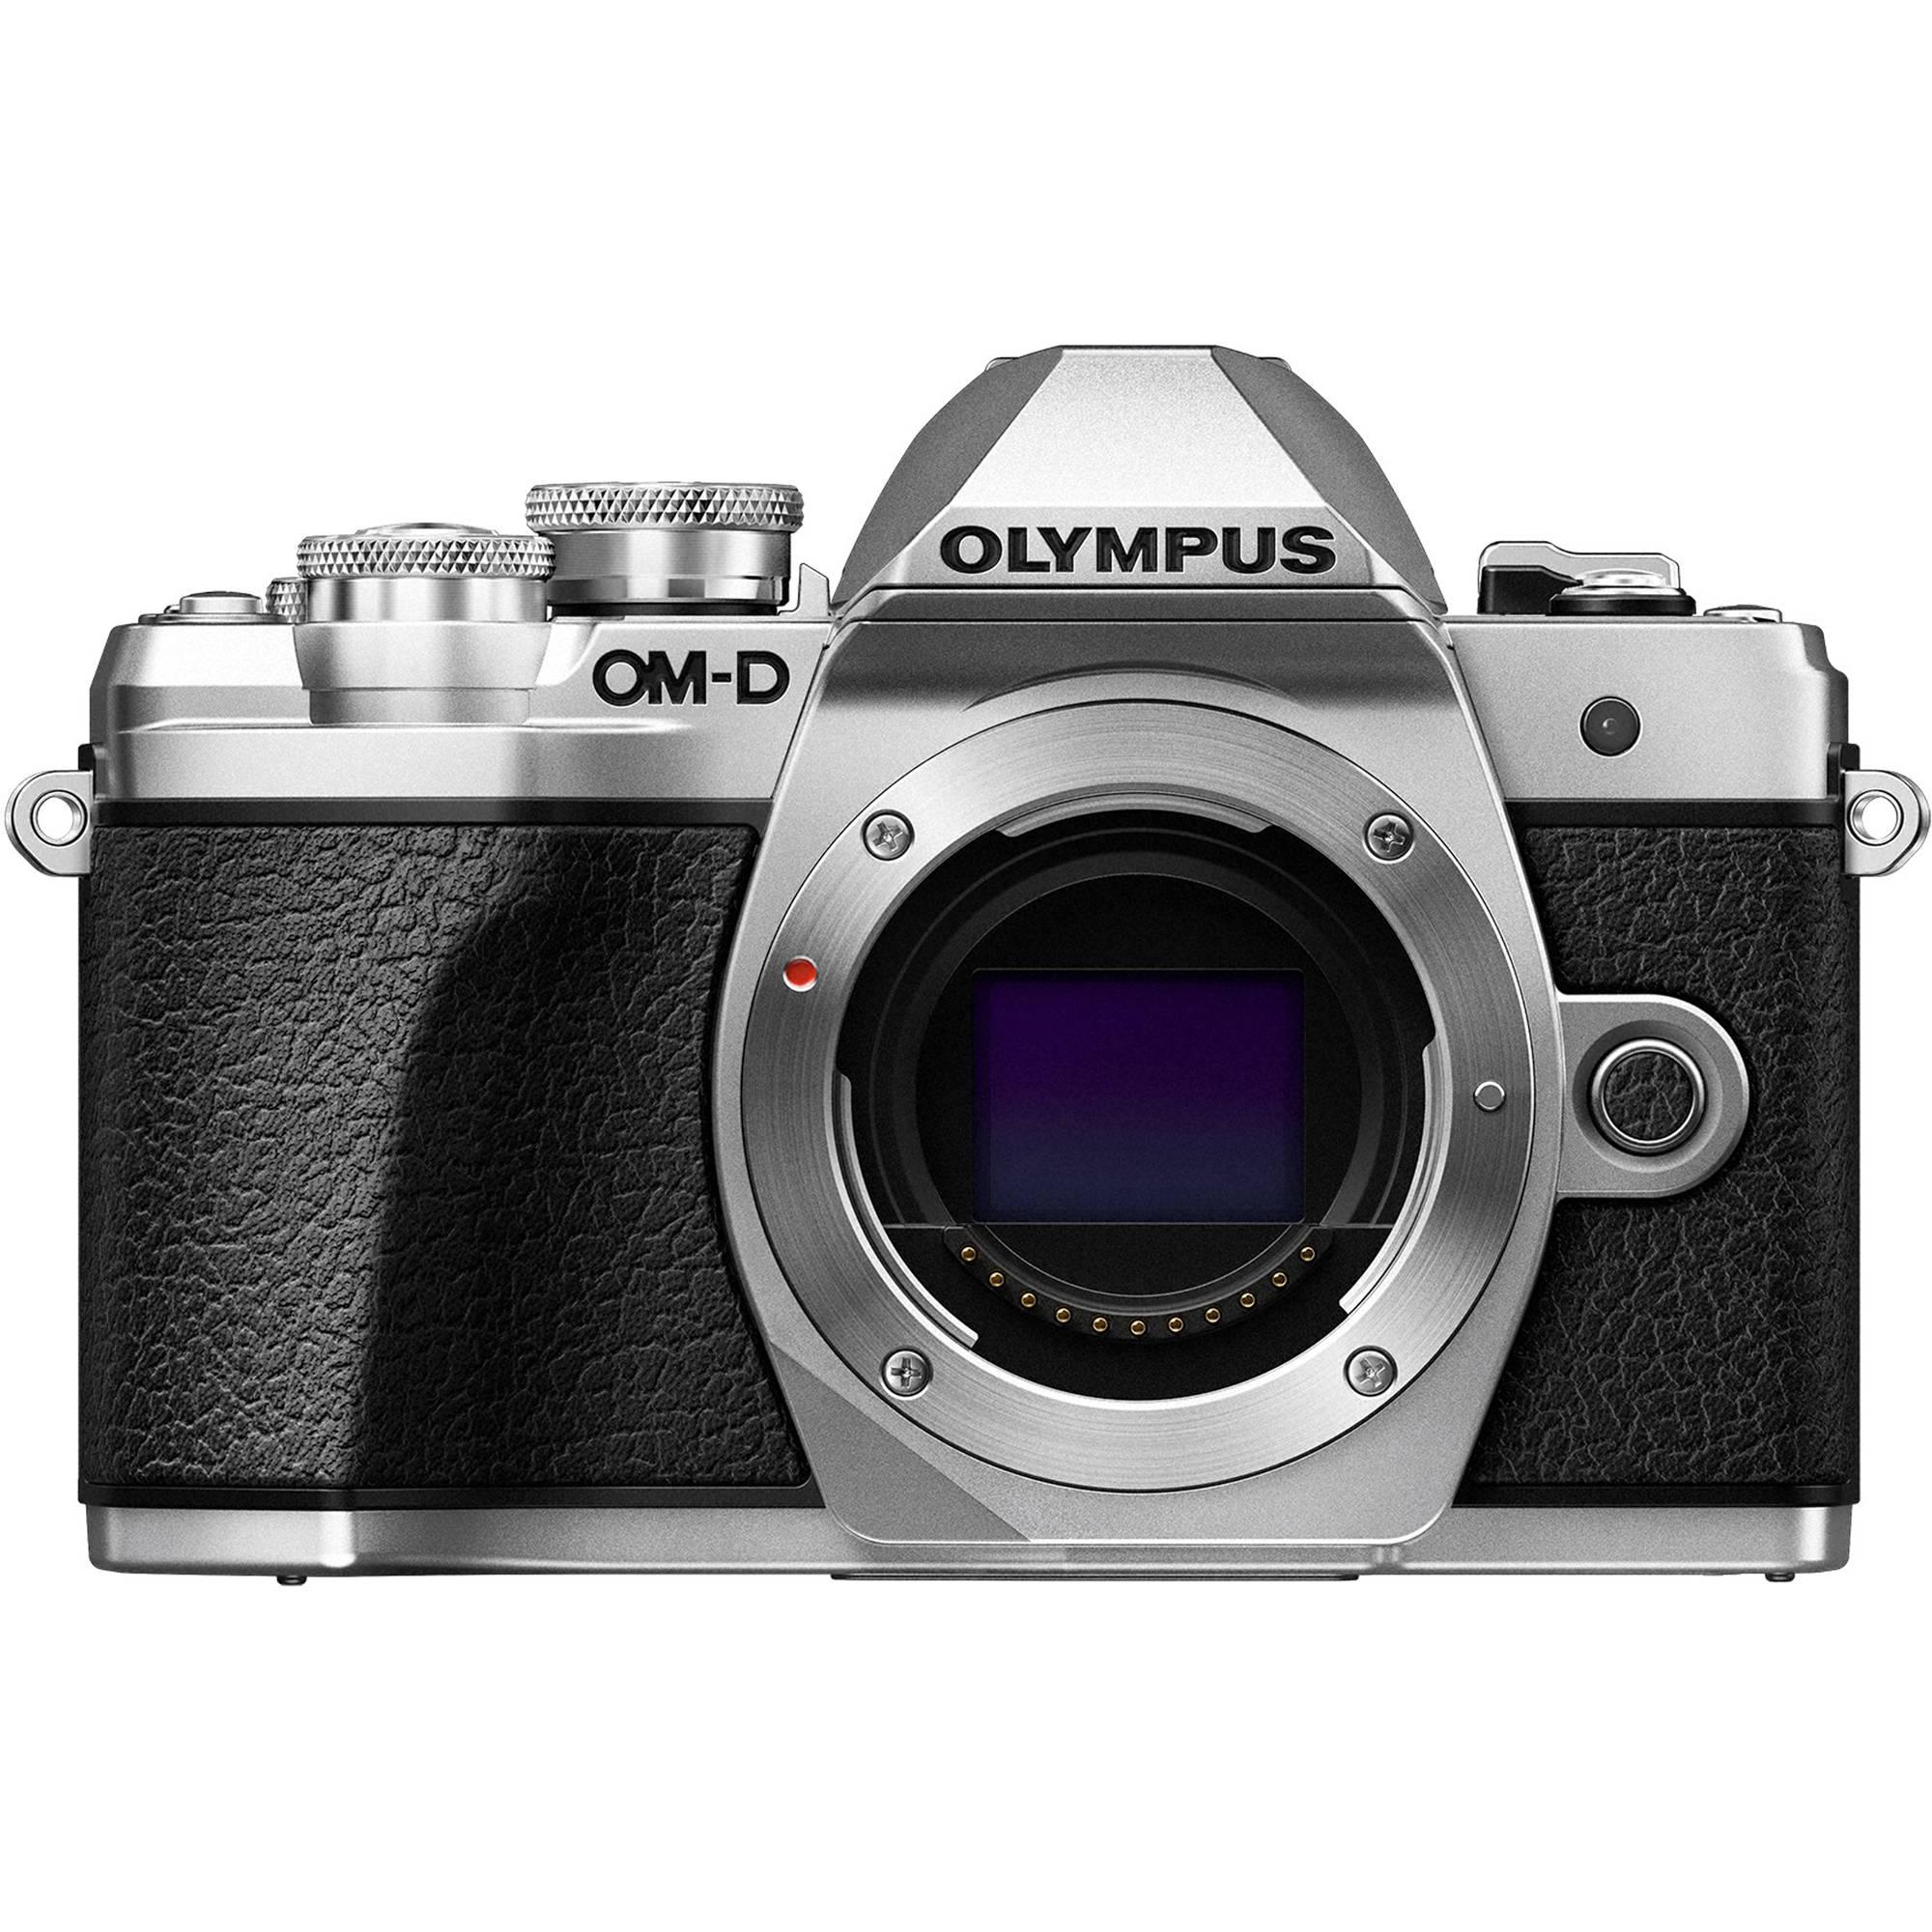 Olympus OM-D E-M10 Mark III Mirrorless Micro Four V207070SU000